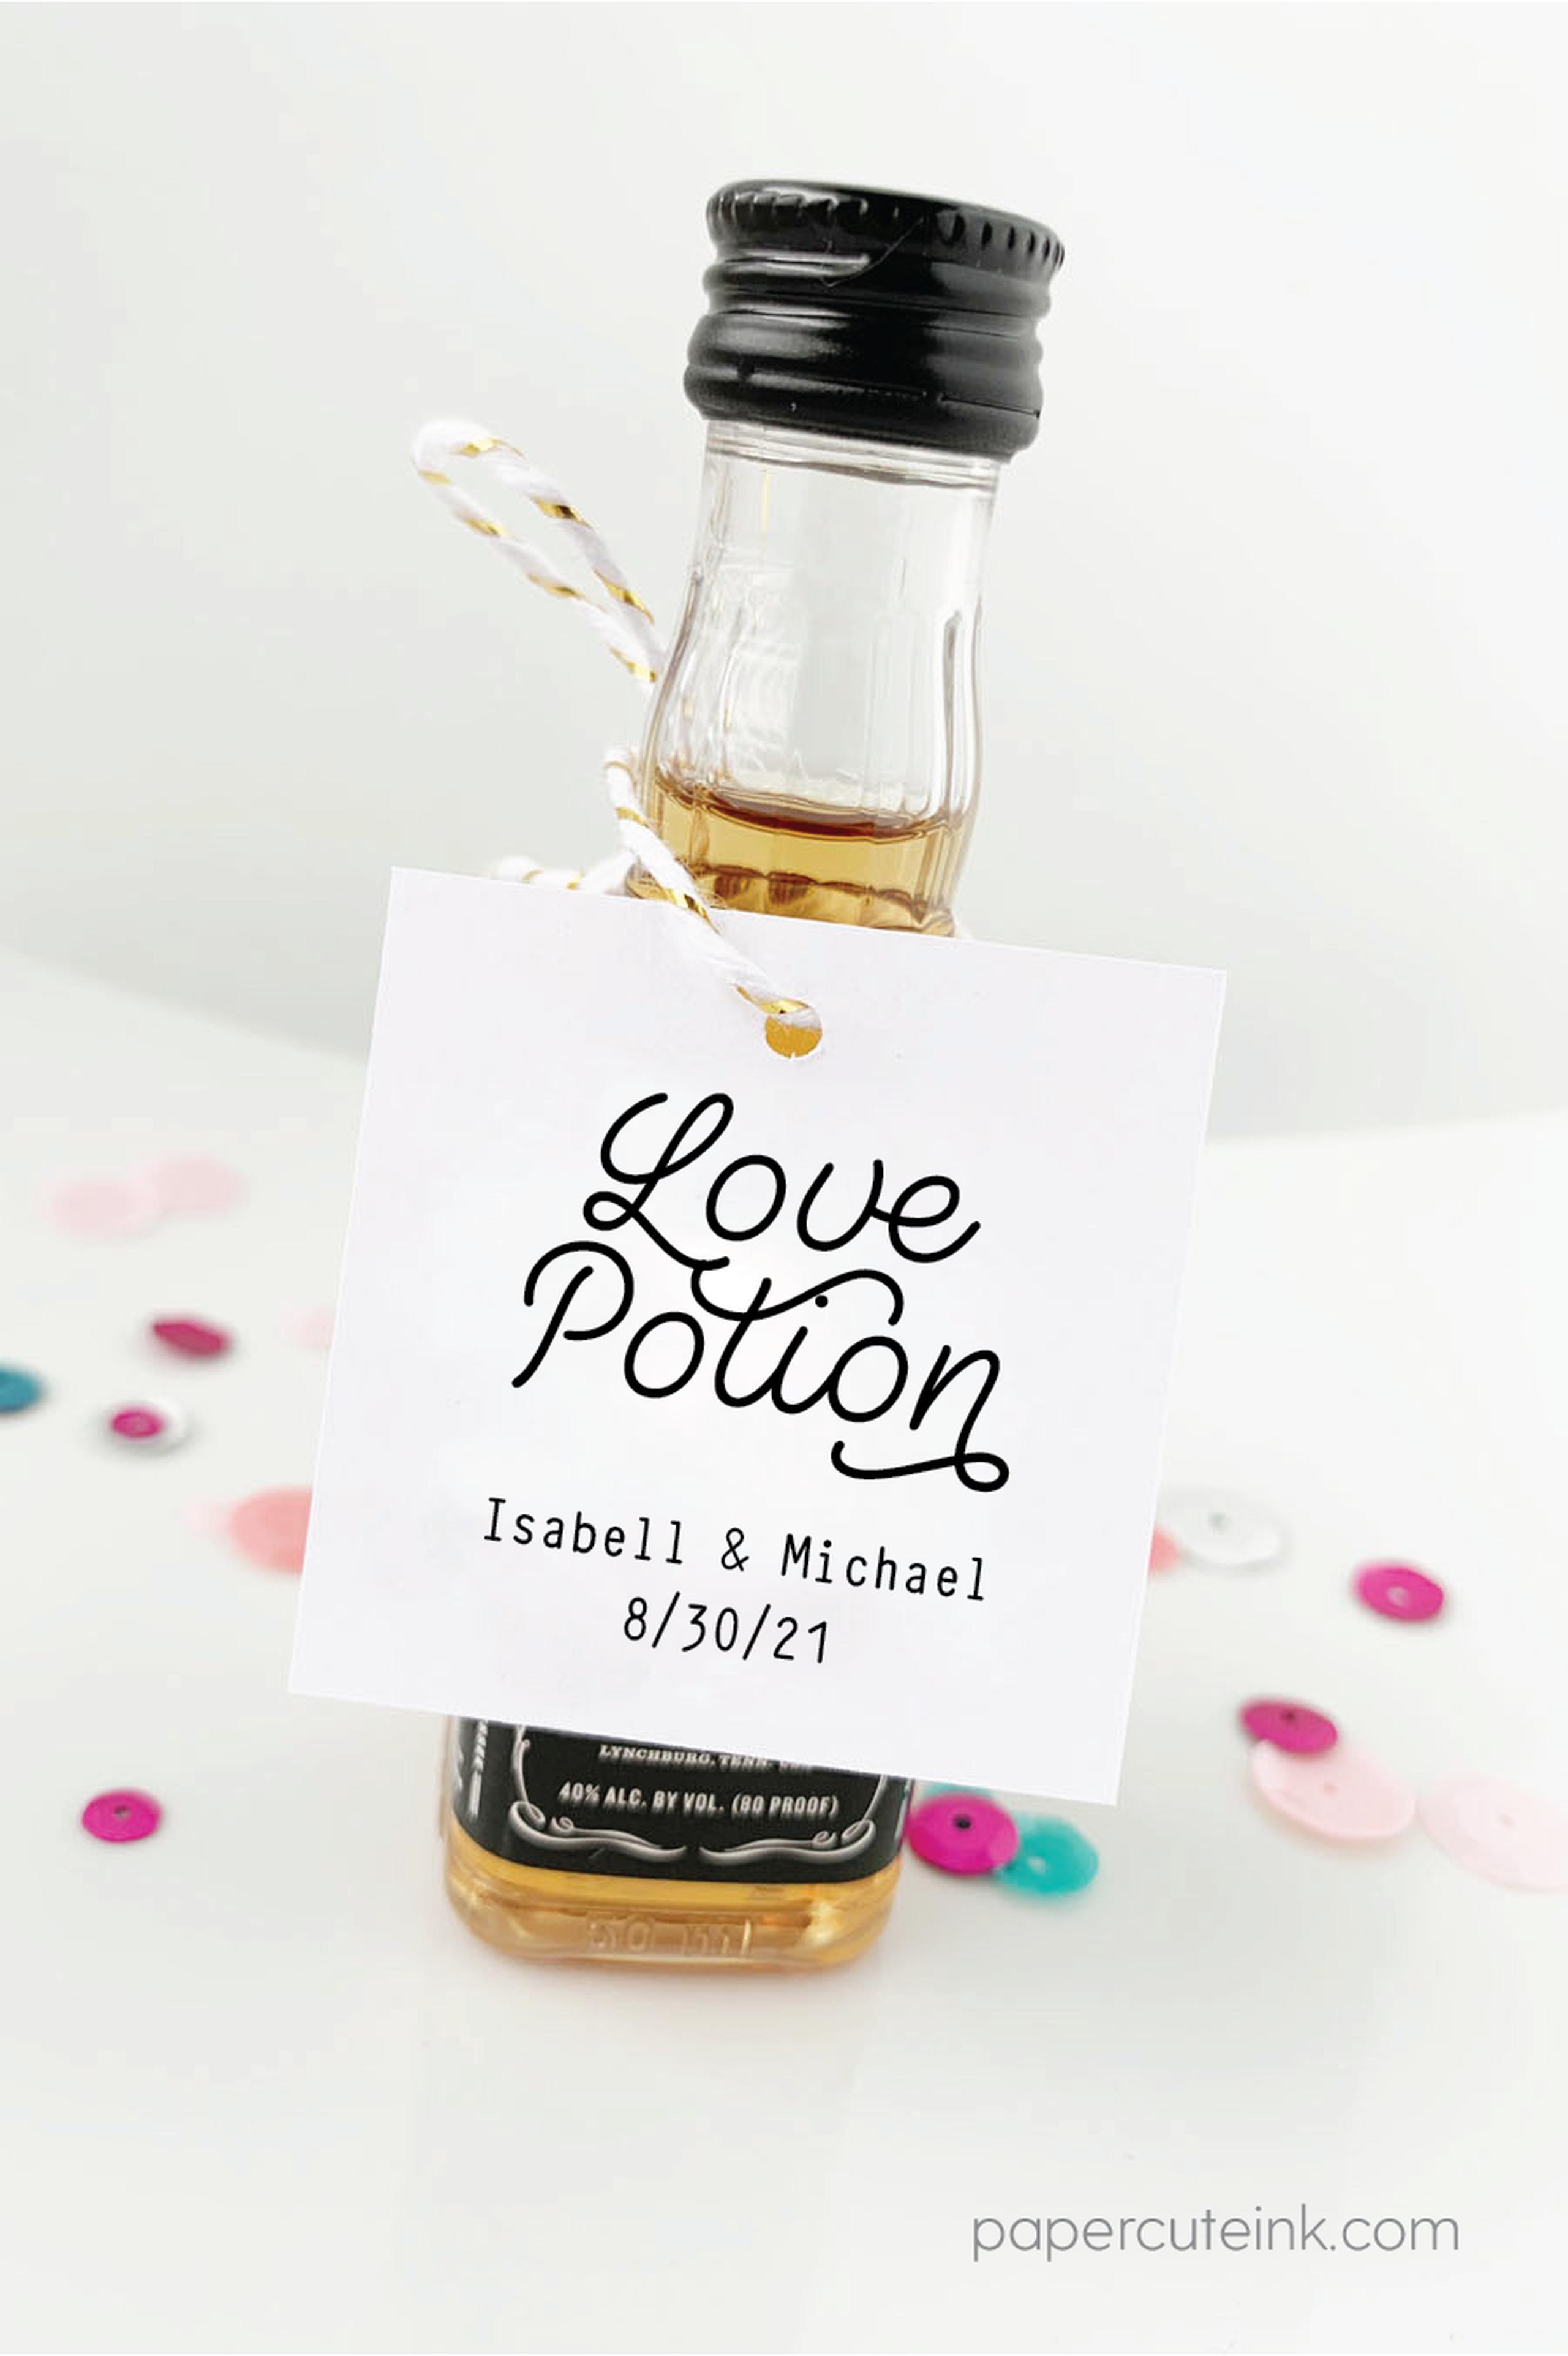 Love Potion Mini Bottle Tags Wedding Favors Wedding Bottles Wedding Favours Bottles Mini Liquor Bottles